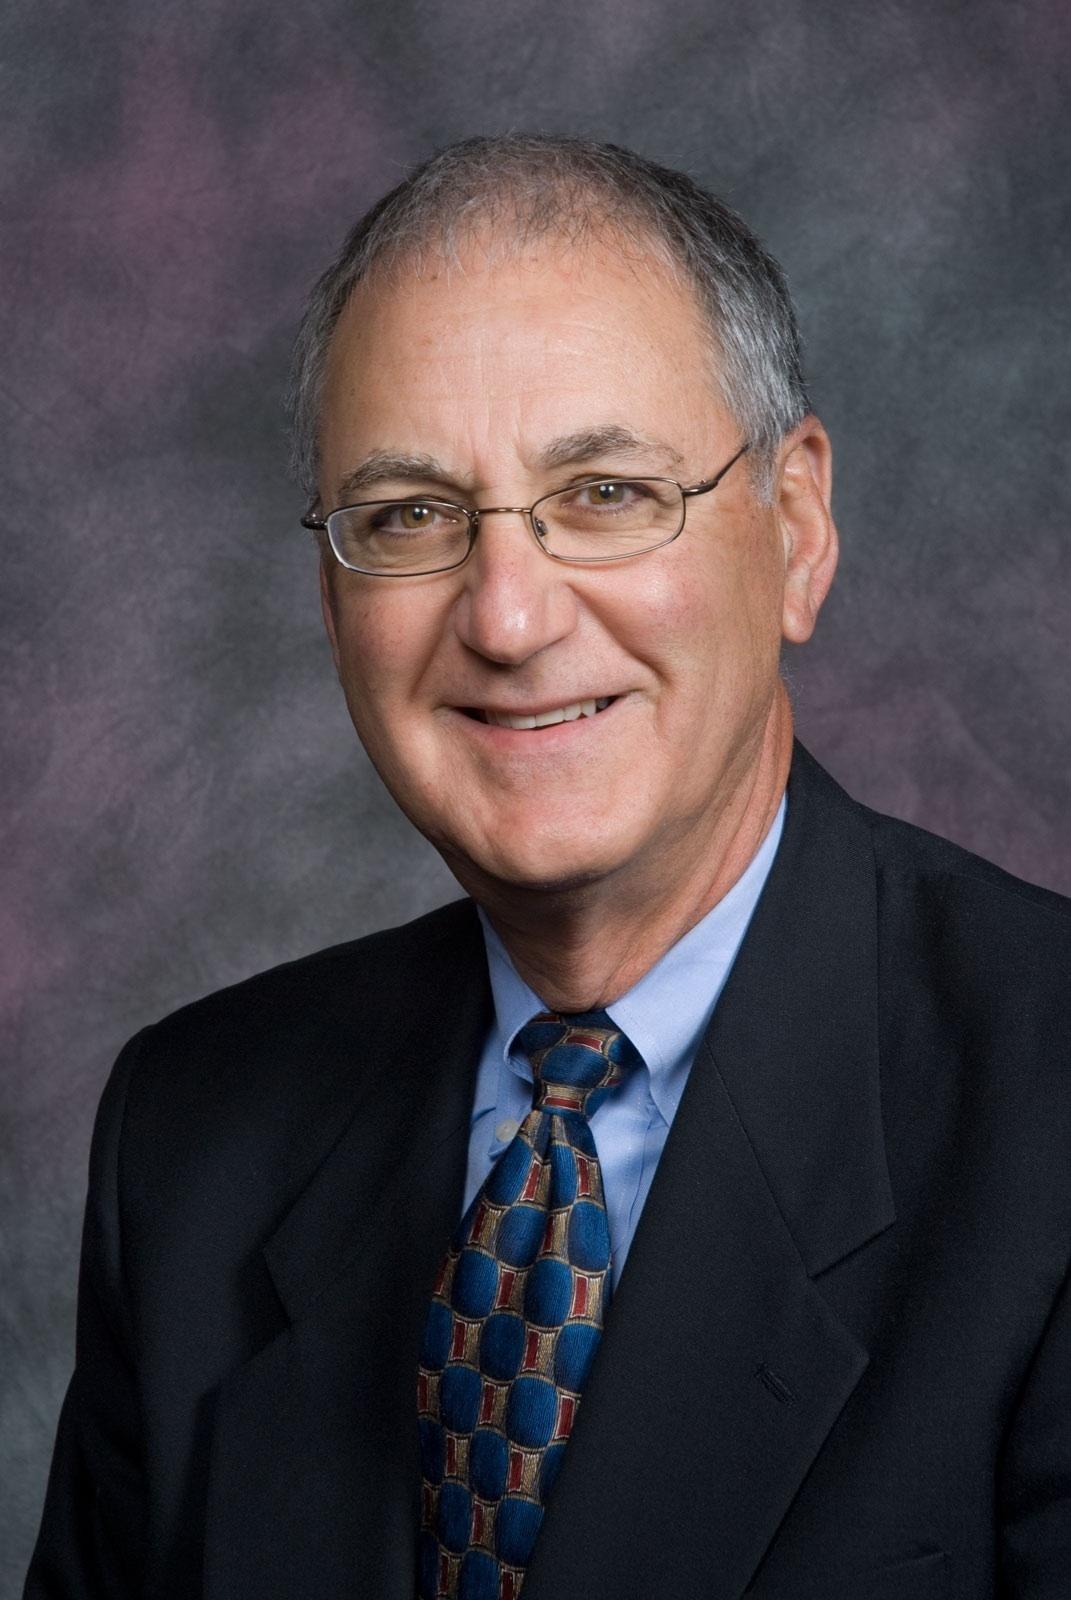 Darell R. Lumaco